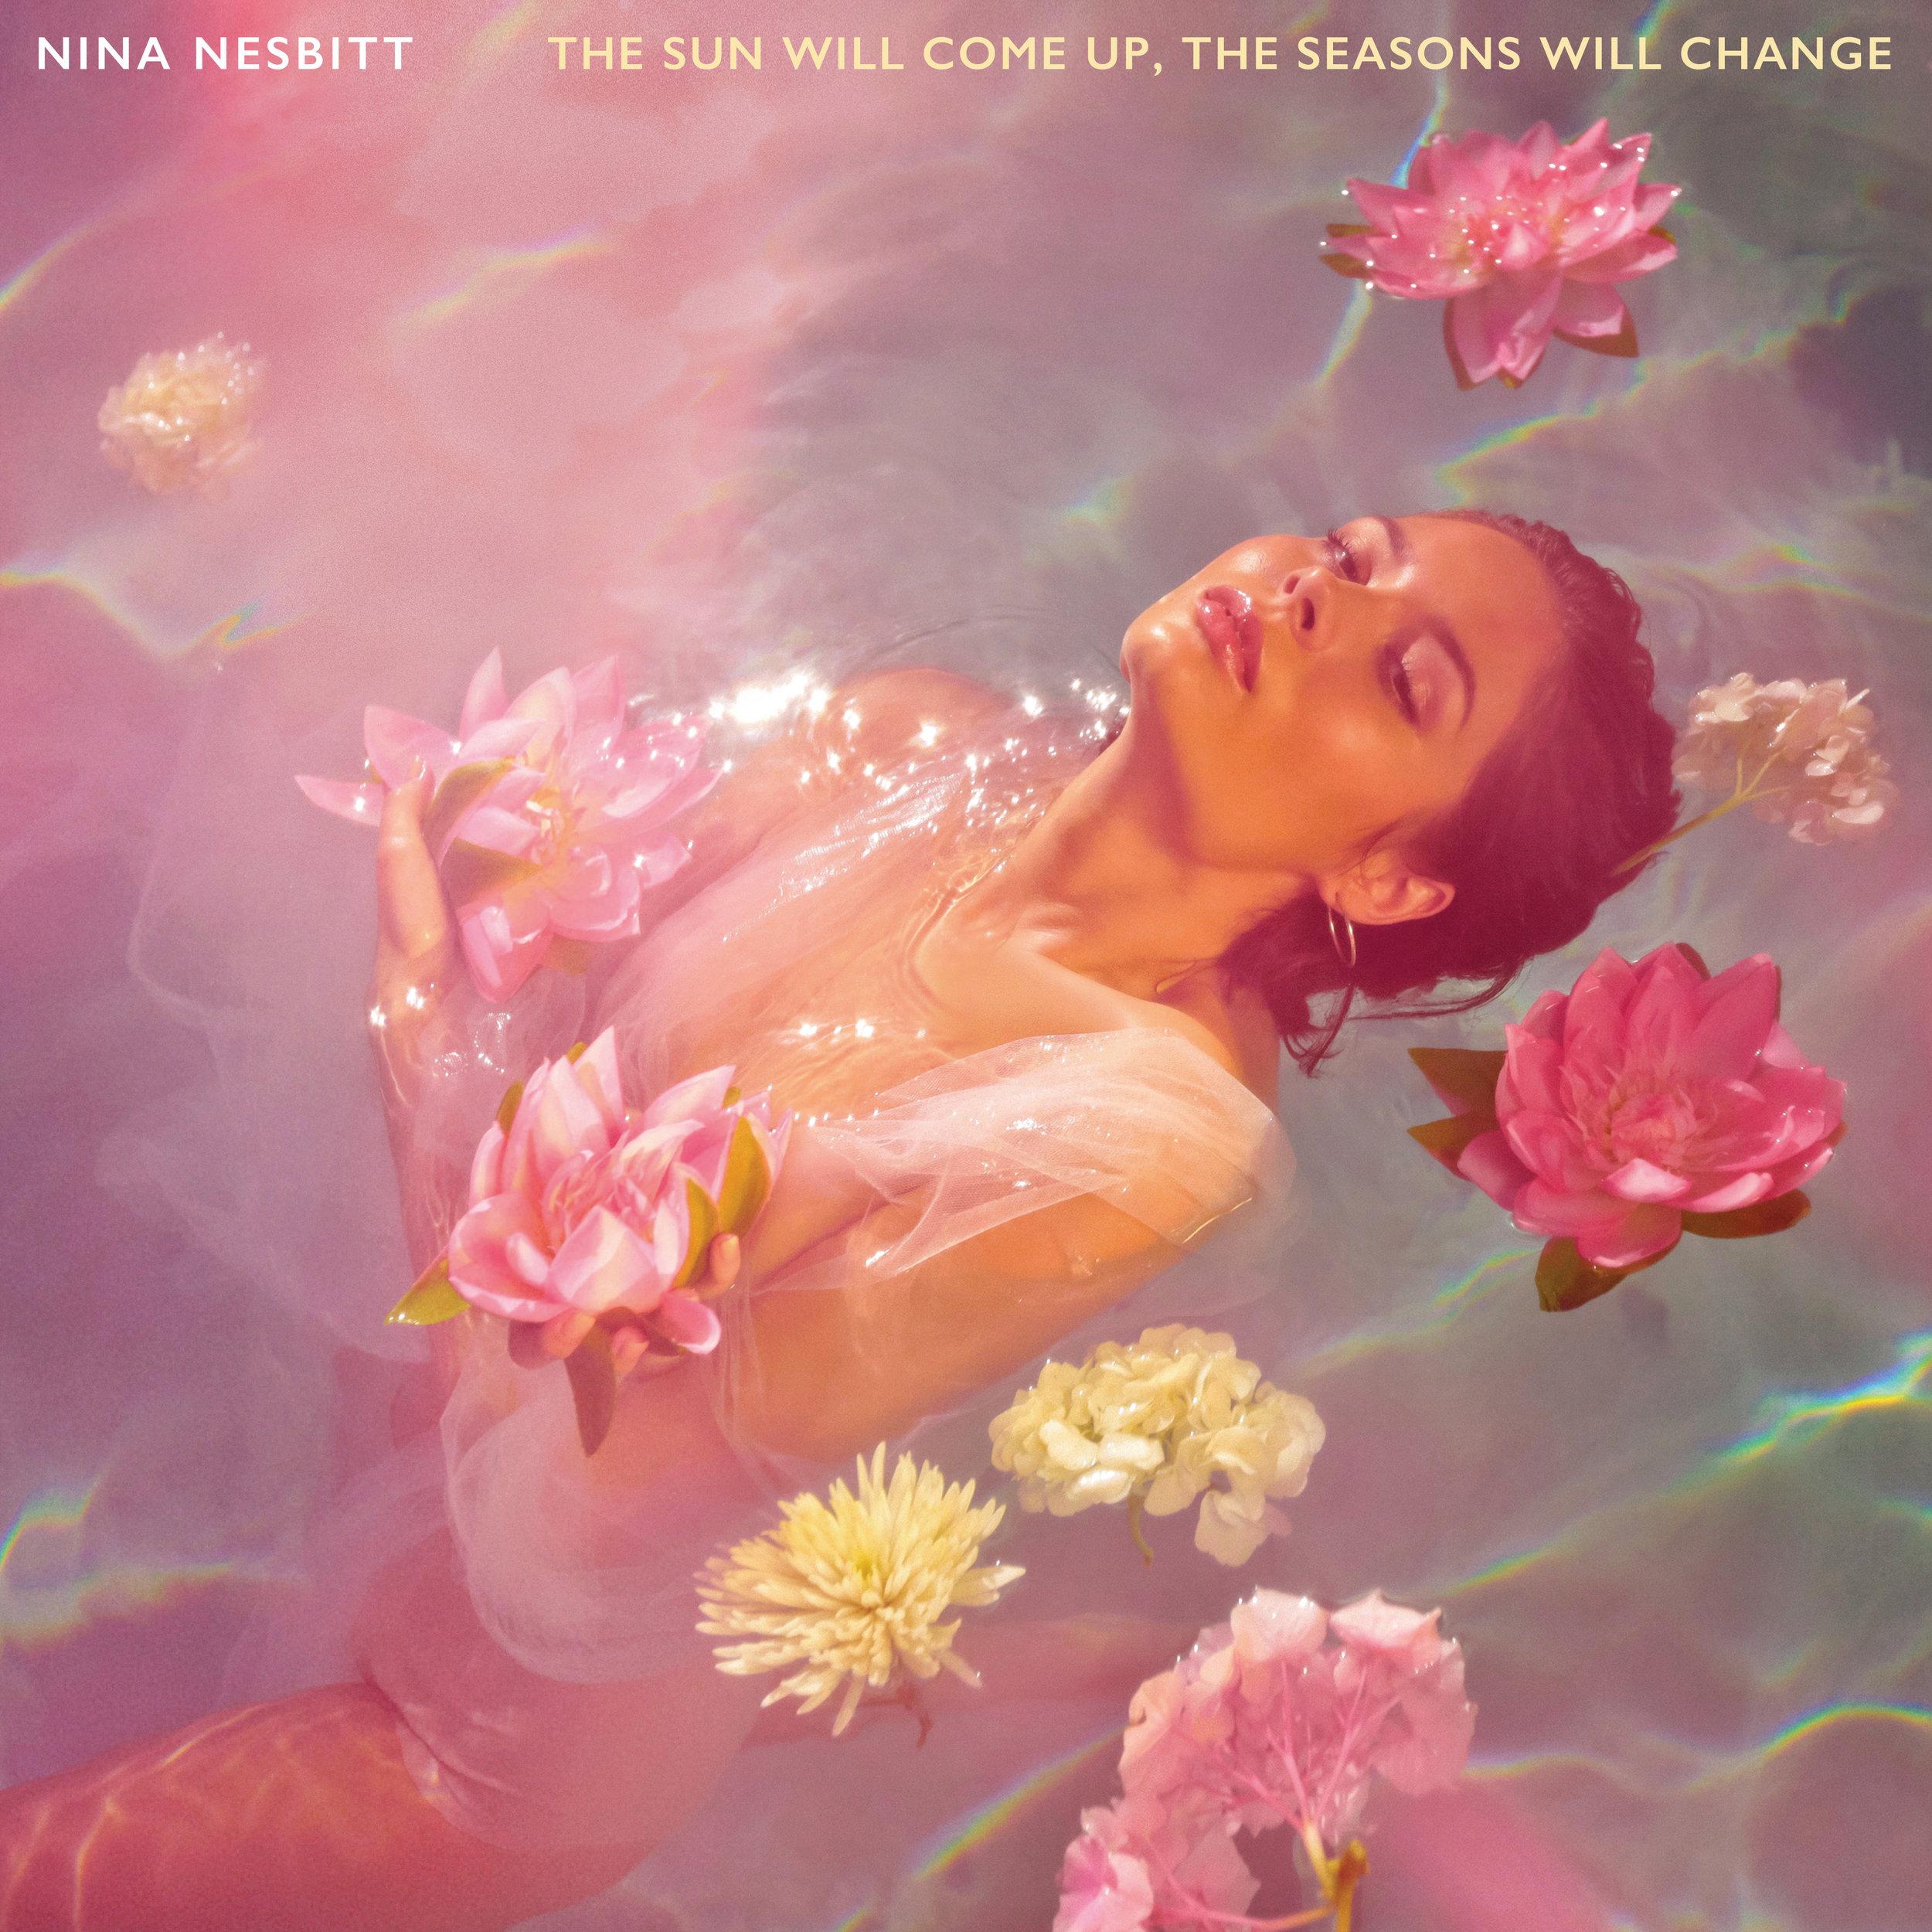 NINA NESBITT - THE SUN WIL COME UP, THE SEASONS WILL CHANGE - RELEASED 1ST FEBRUARY 2019